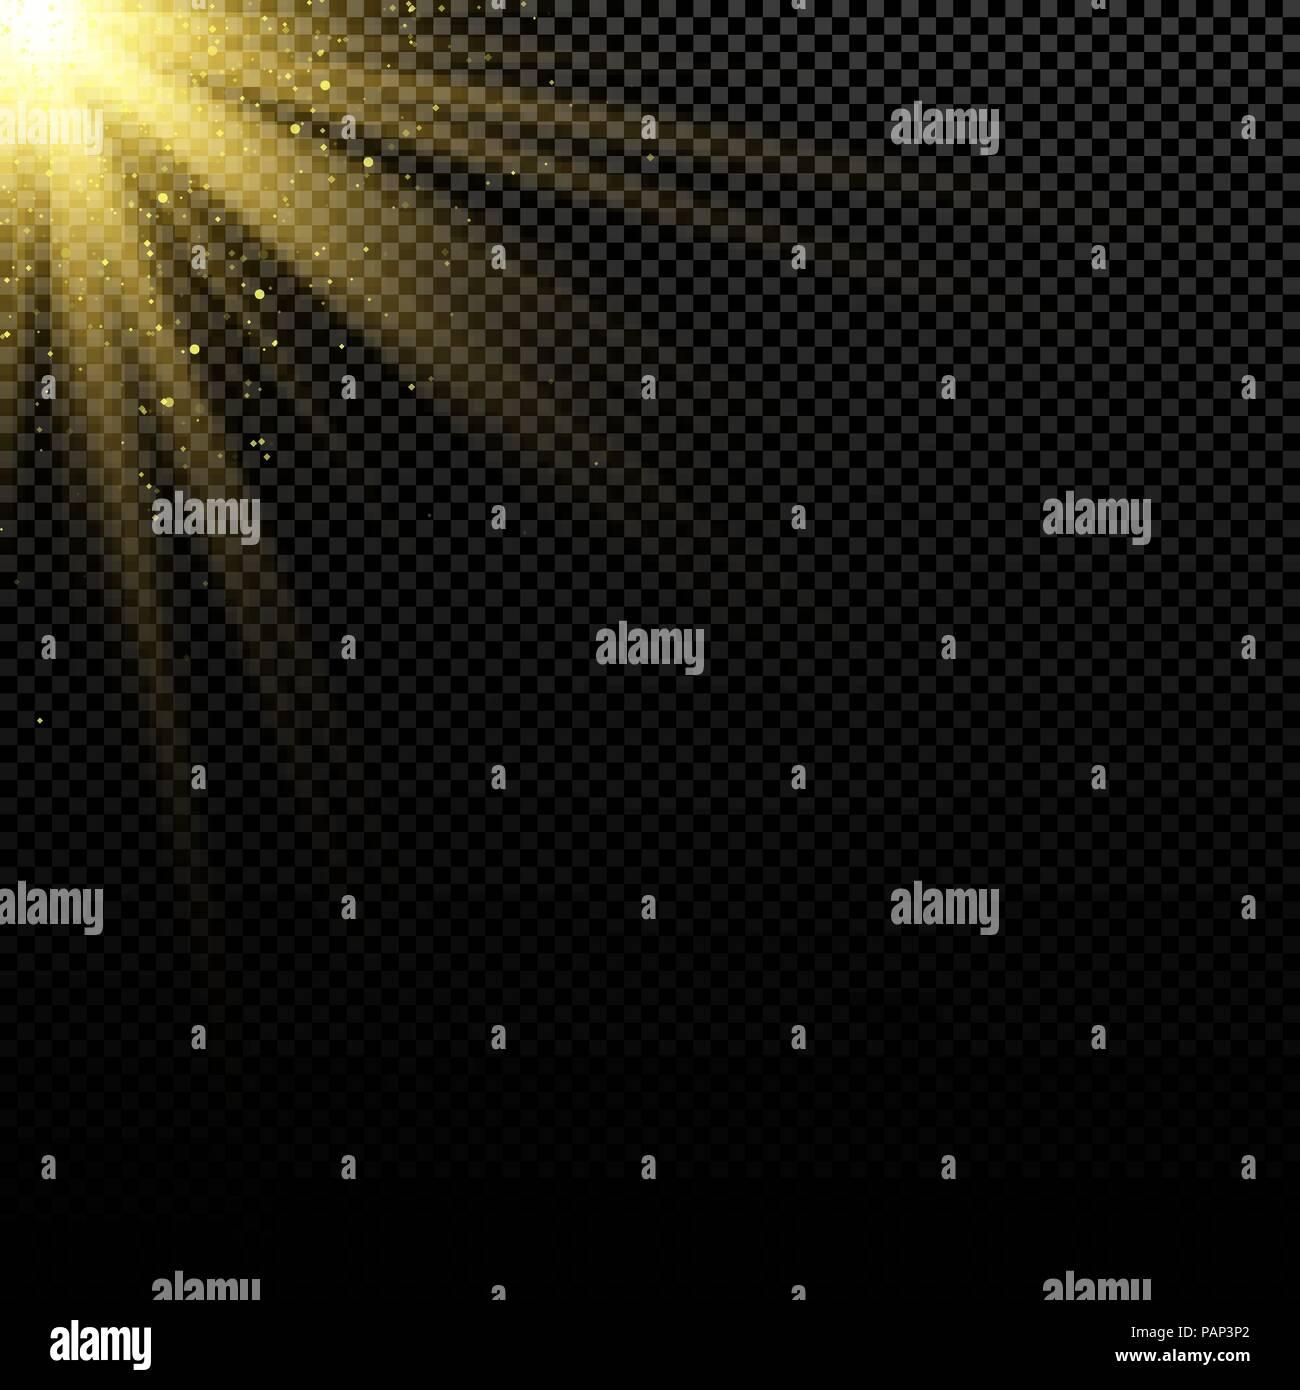 2019 year style- Dark stylish background light text